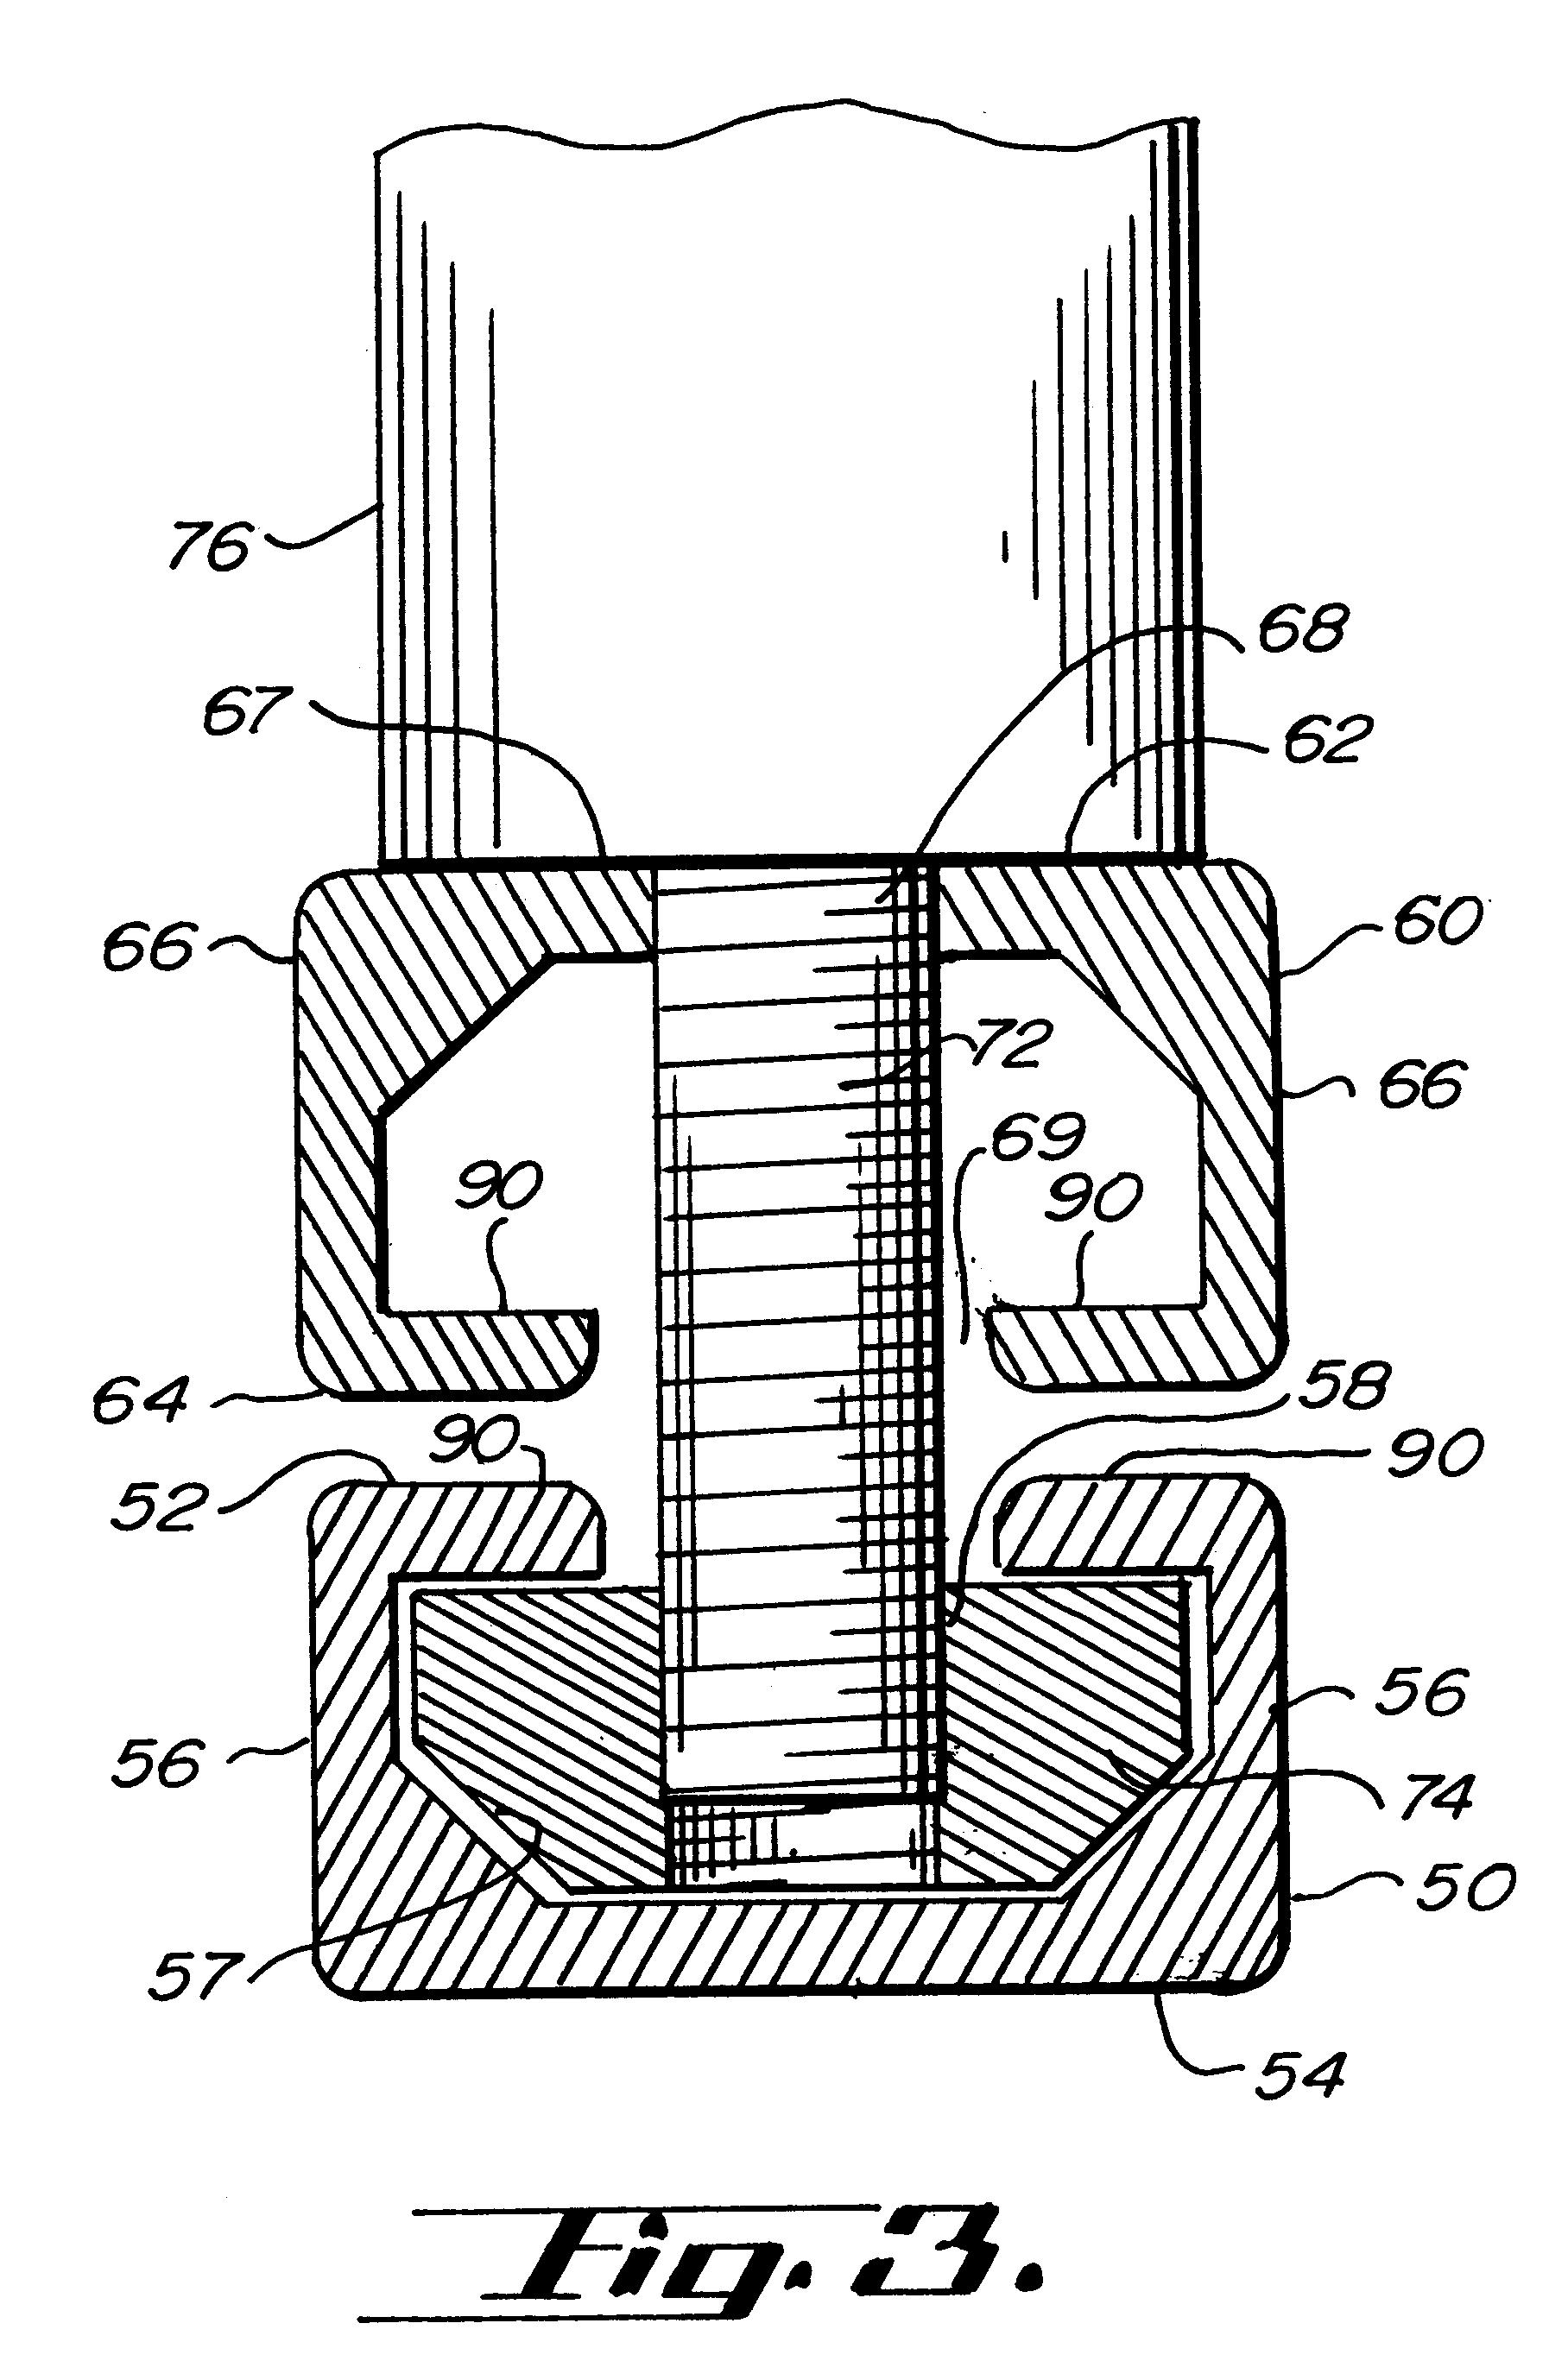 bennett trim tab switch wiring diagram view diagram